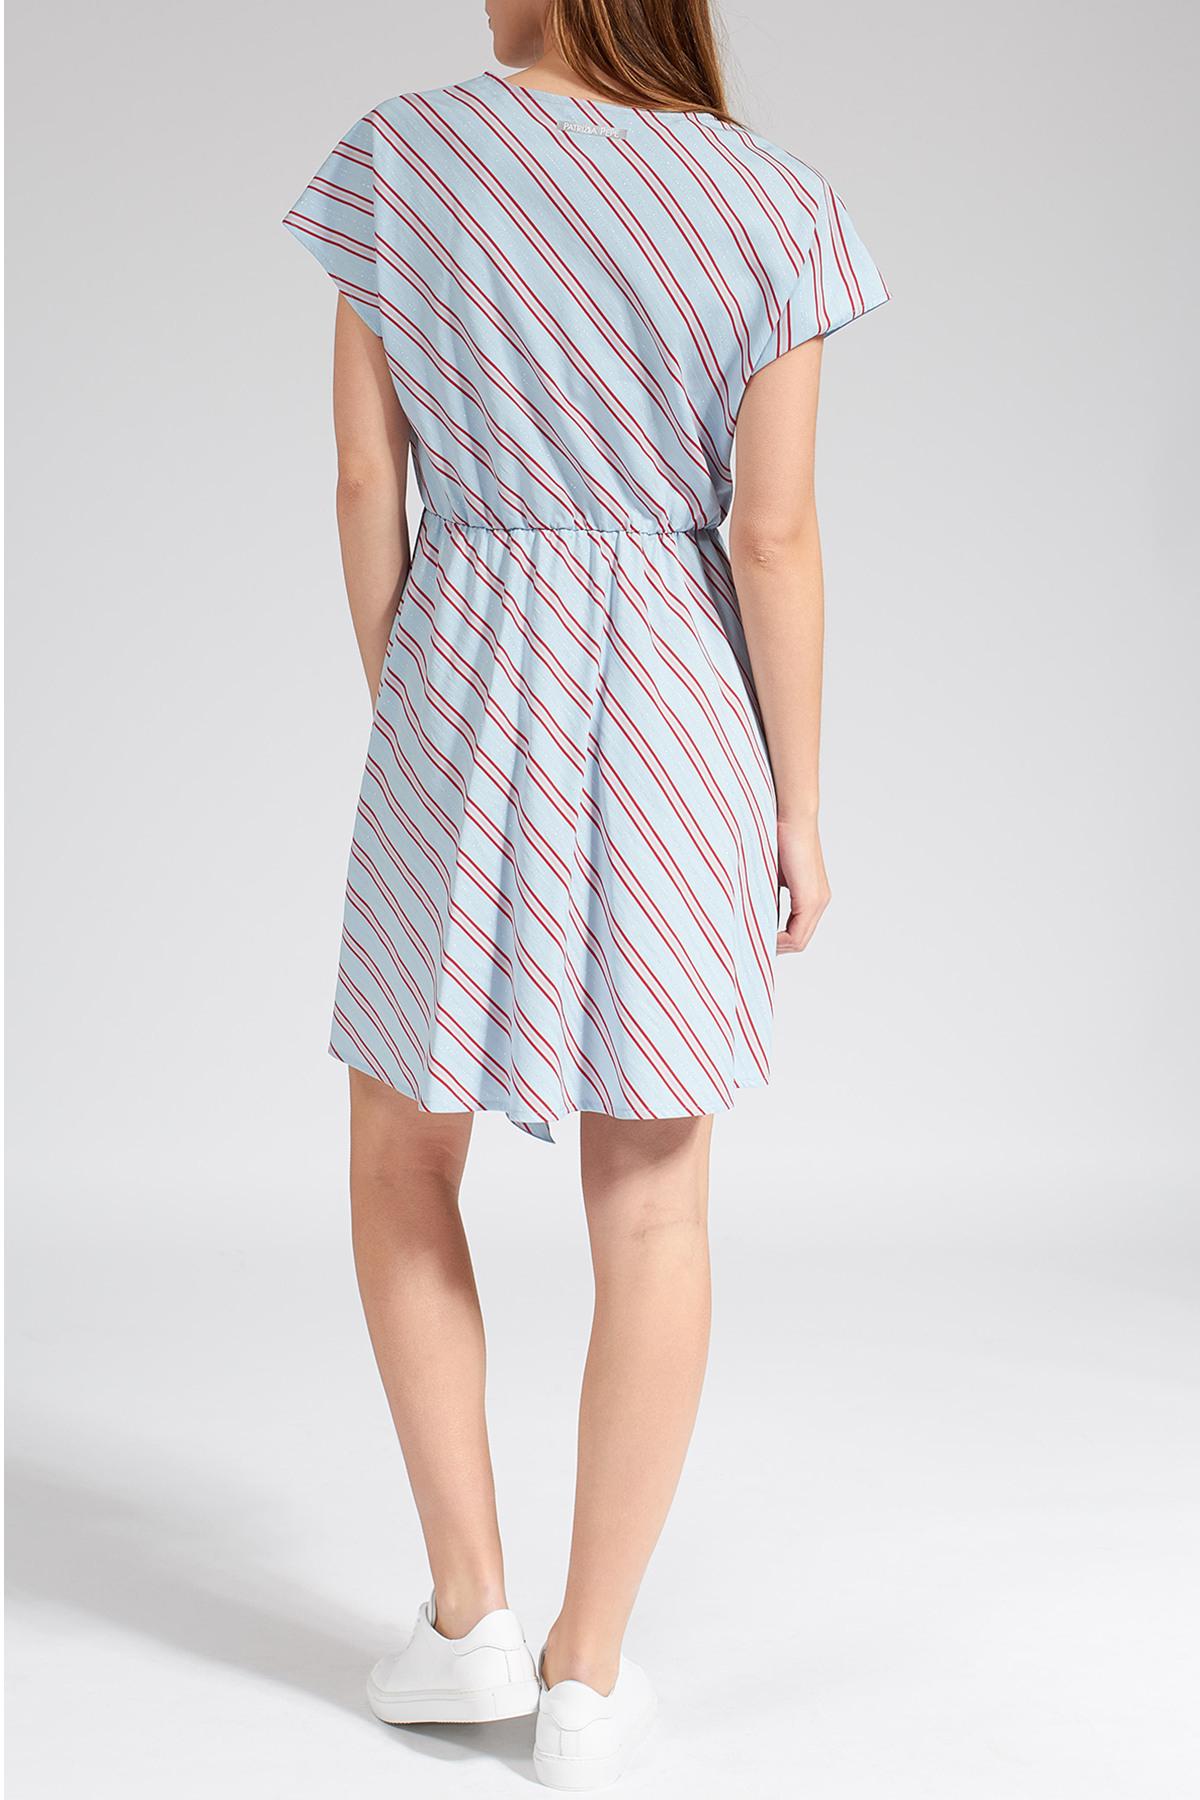 Knielanges Kleid Mit Streifenmuster  Patrizia Pepe